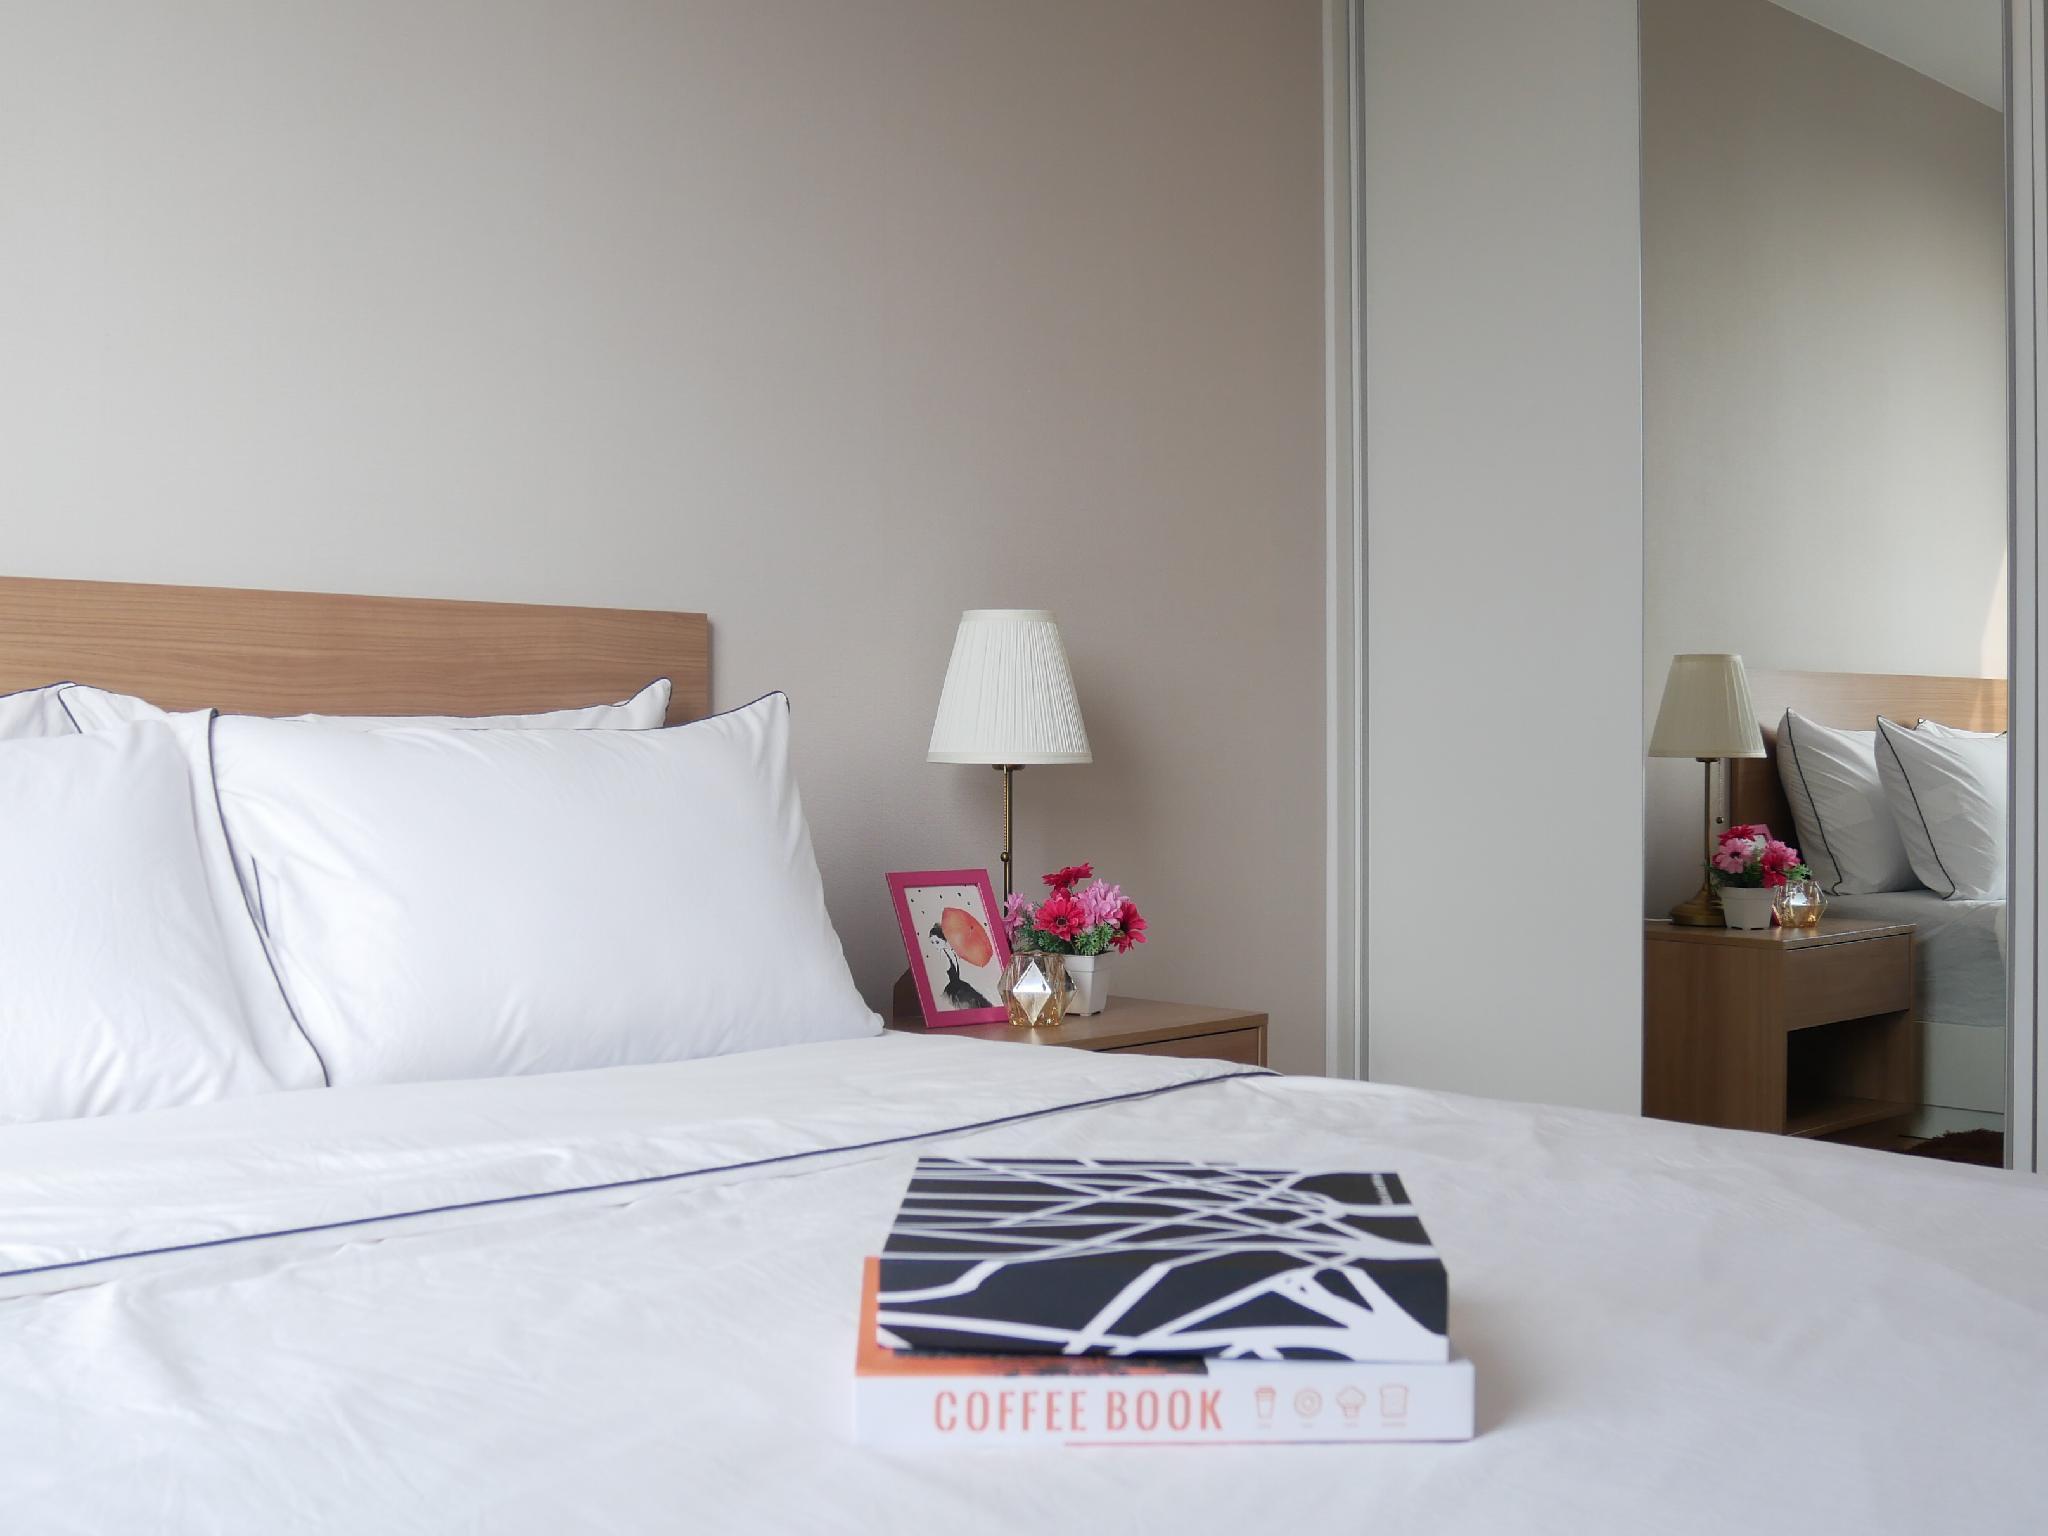 Brand New Modren@Sukhumvit /wifi/cozy/nice view อพาร์ตเมนต์ 1 ห้องนอน 1 ห้องน้ำส่วนตัว ขนาด 28 ตร.ม. – สุขุมวิท